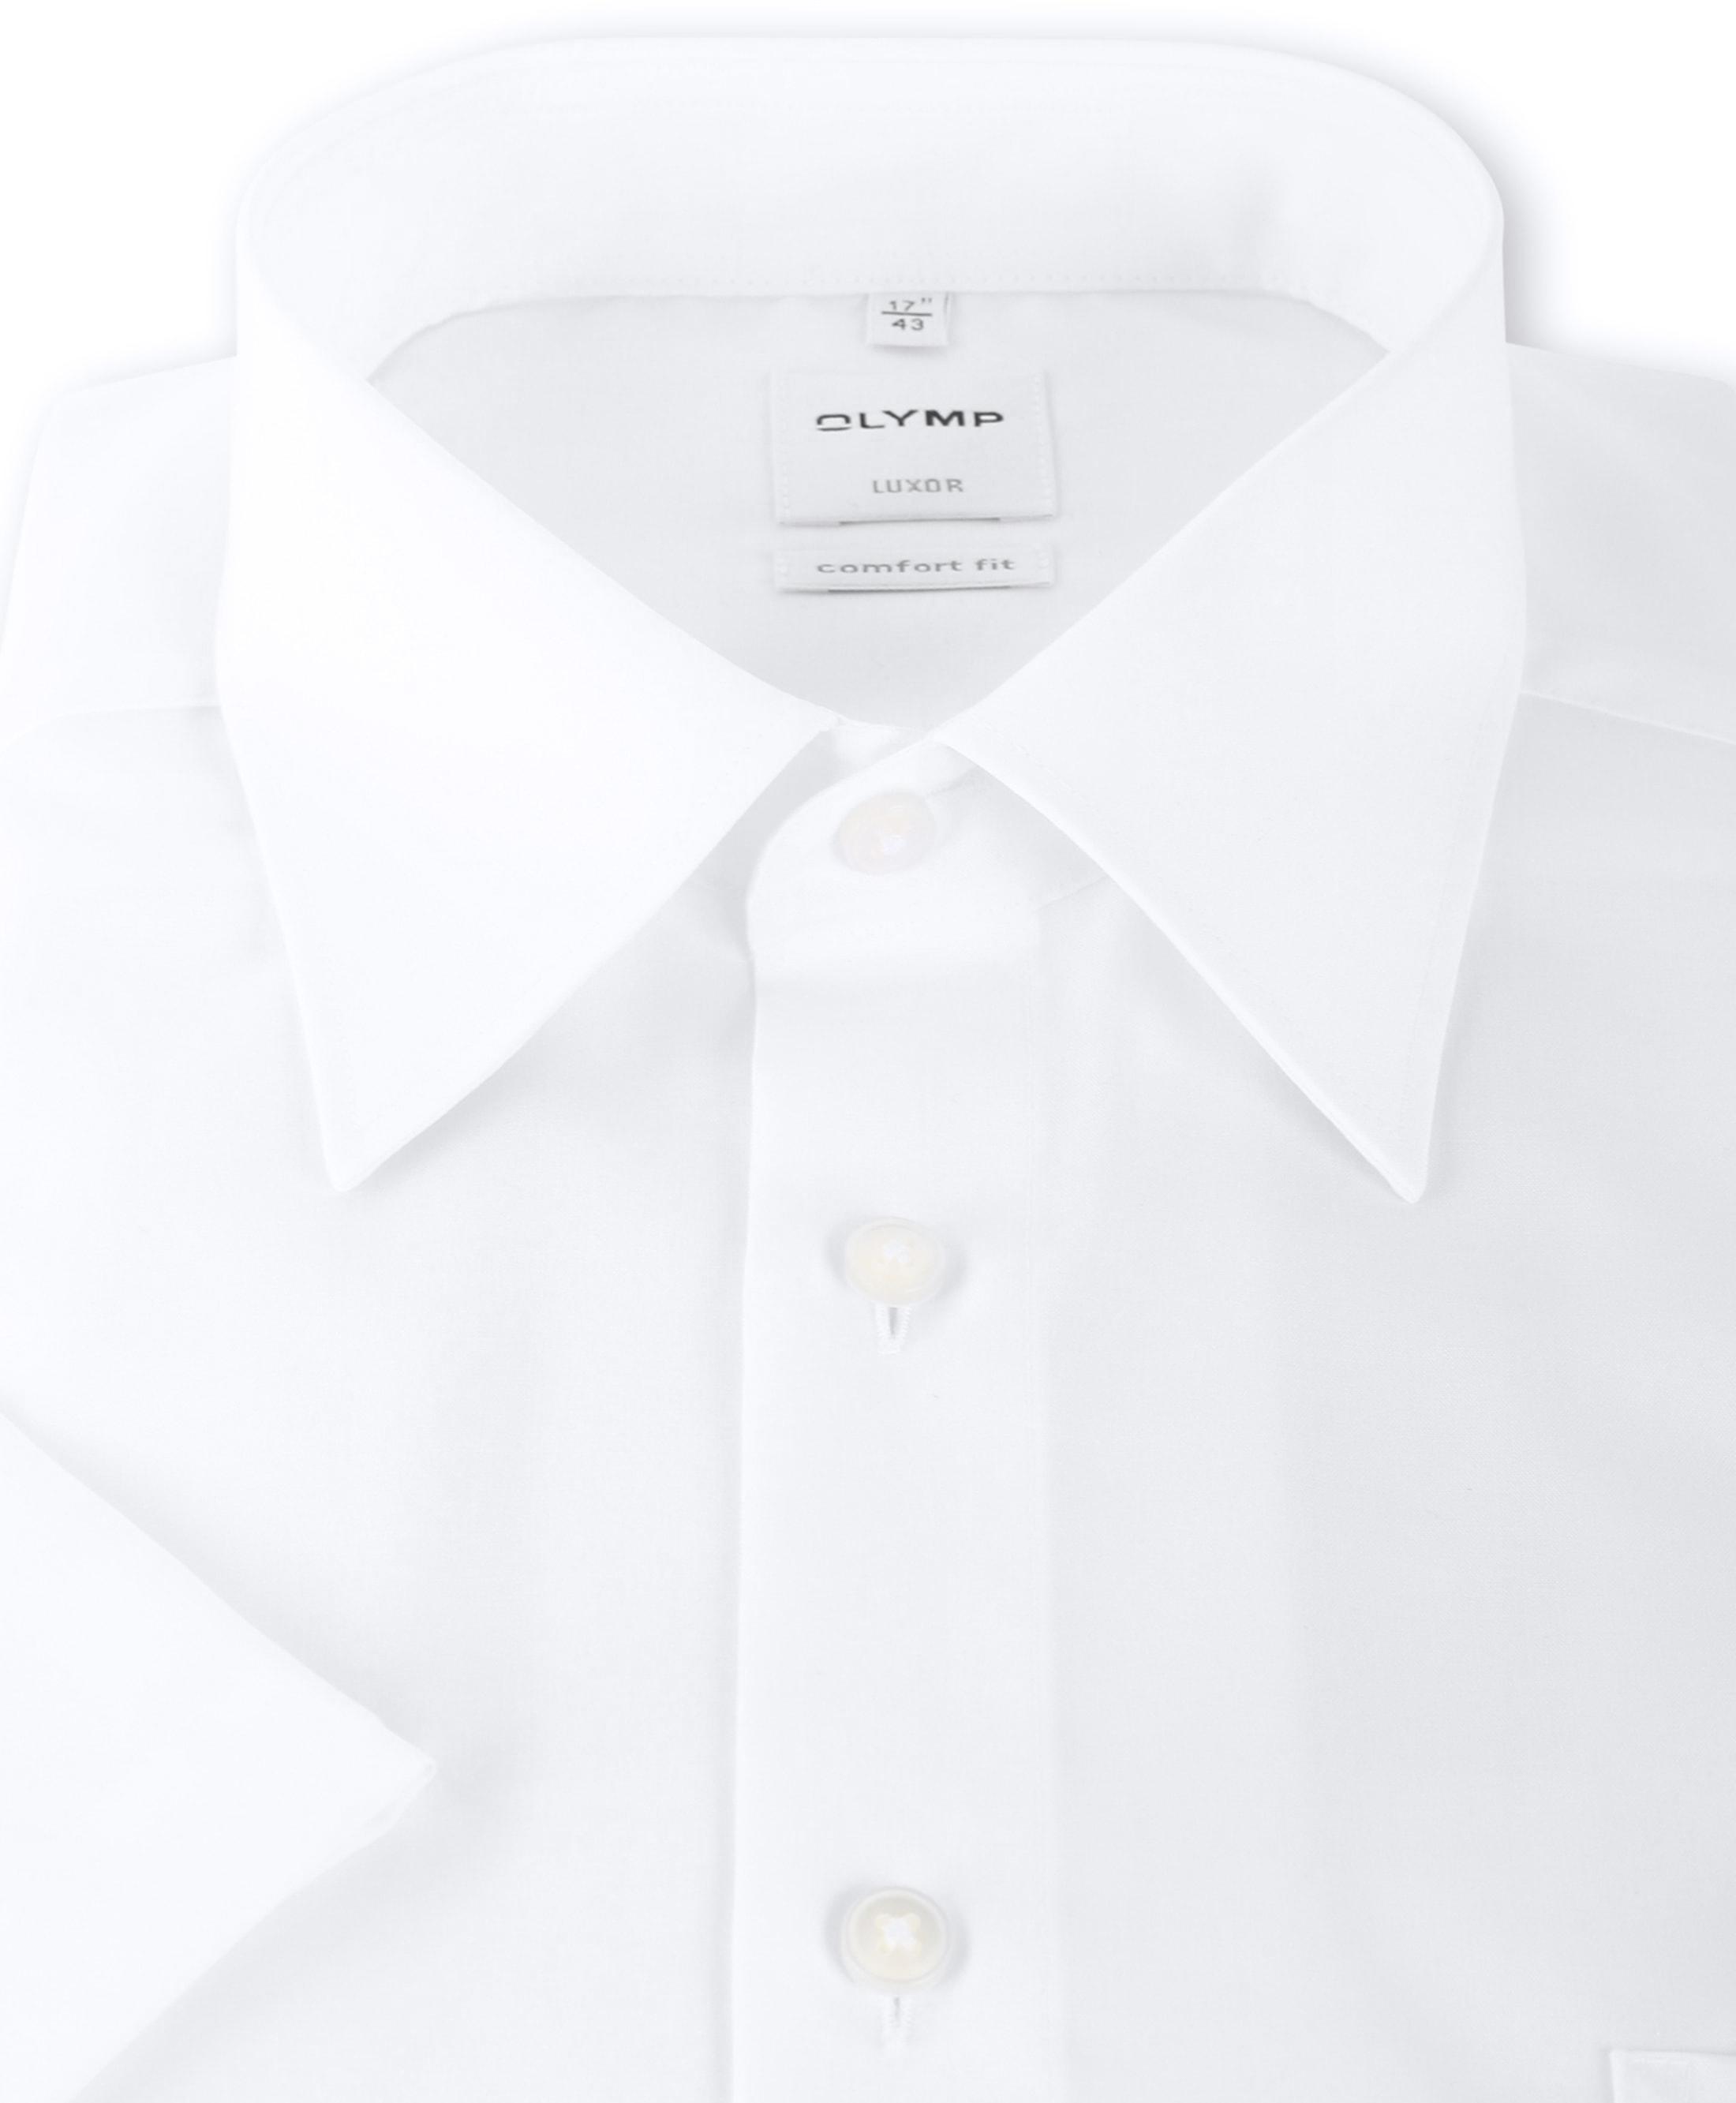 OLYMP Luxor Shirt Comfort Fit Wit Korte Mouw foto 2